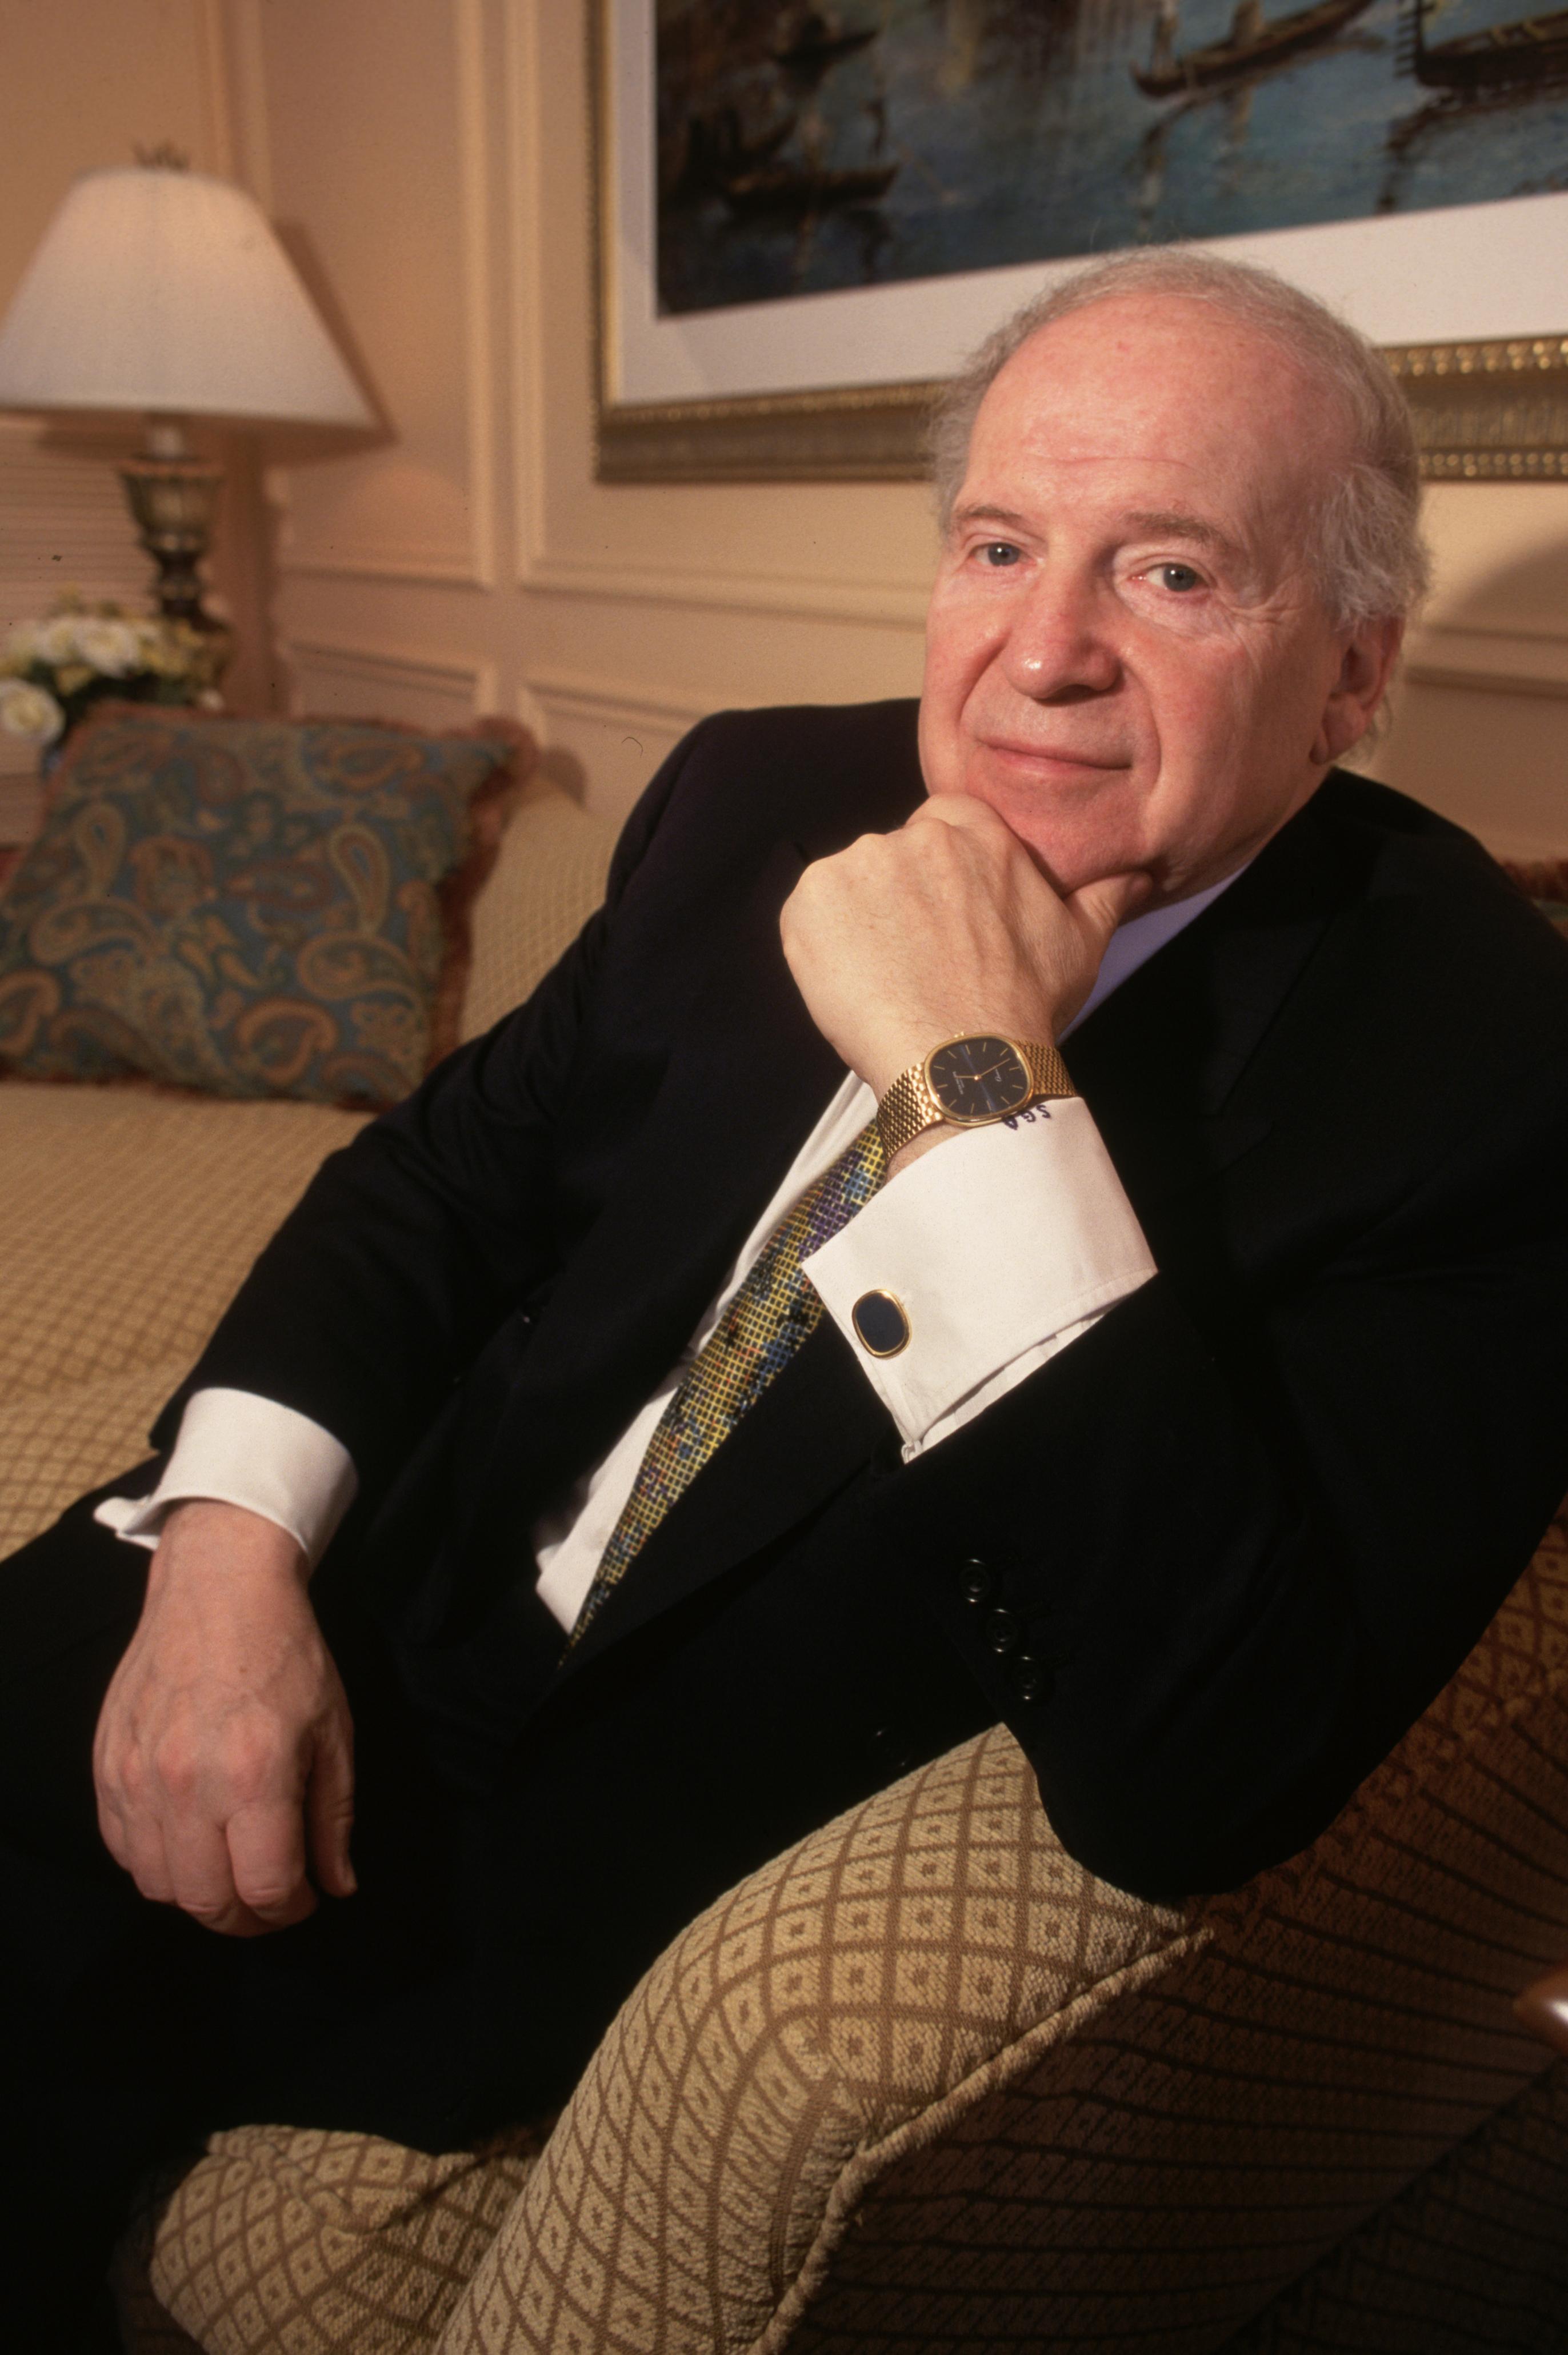 Las Vegas Sands Executive Sheldon Adelson Reclining